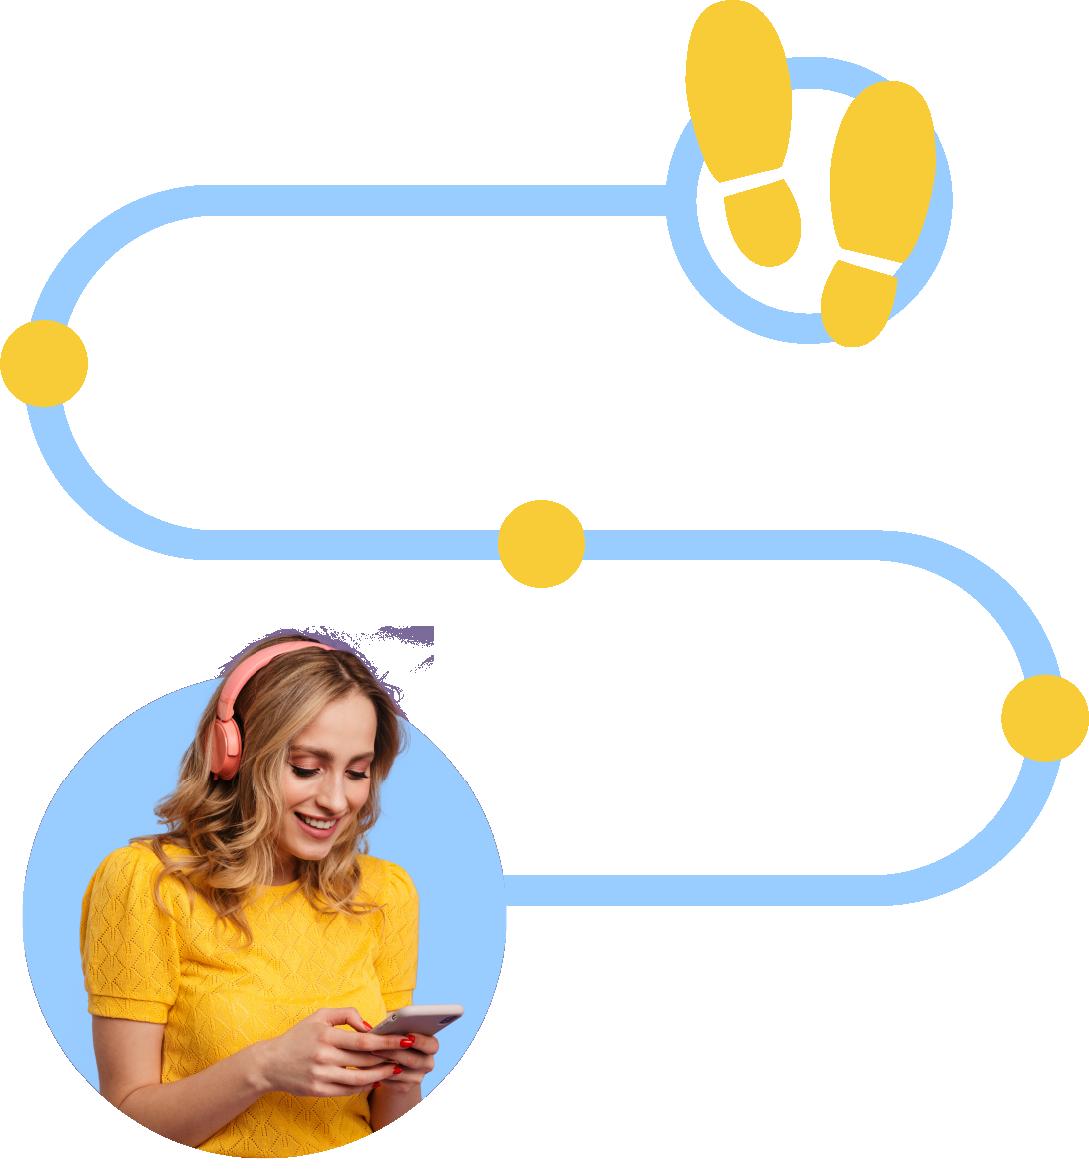 Customer Journey in CX